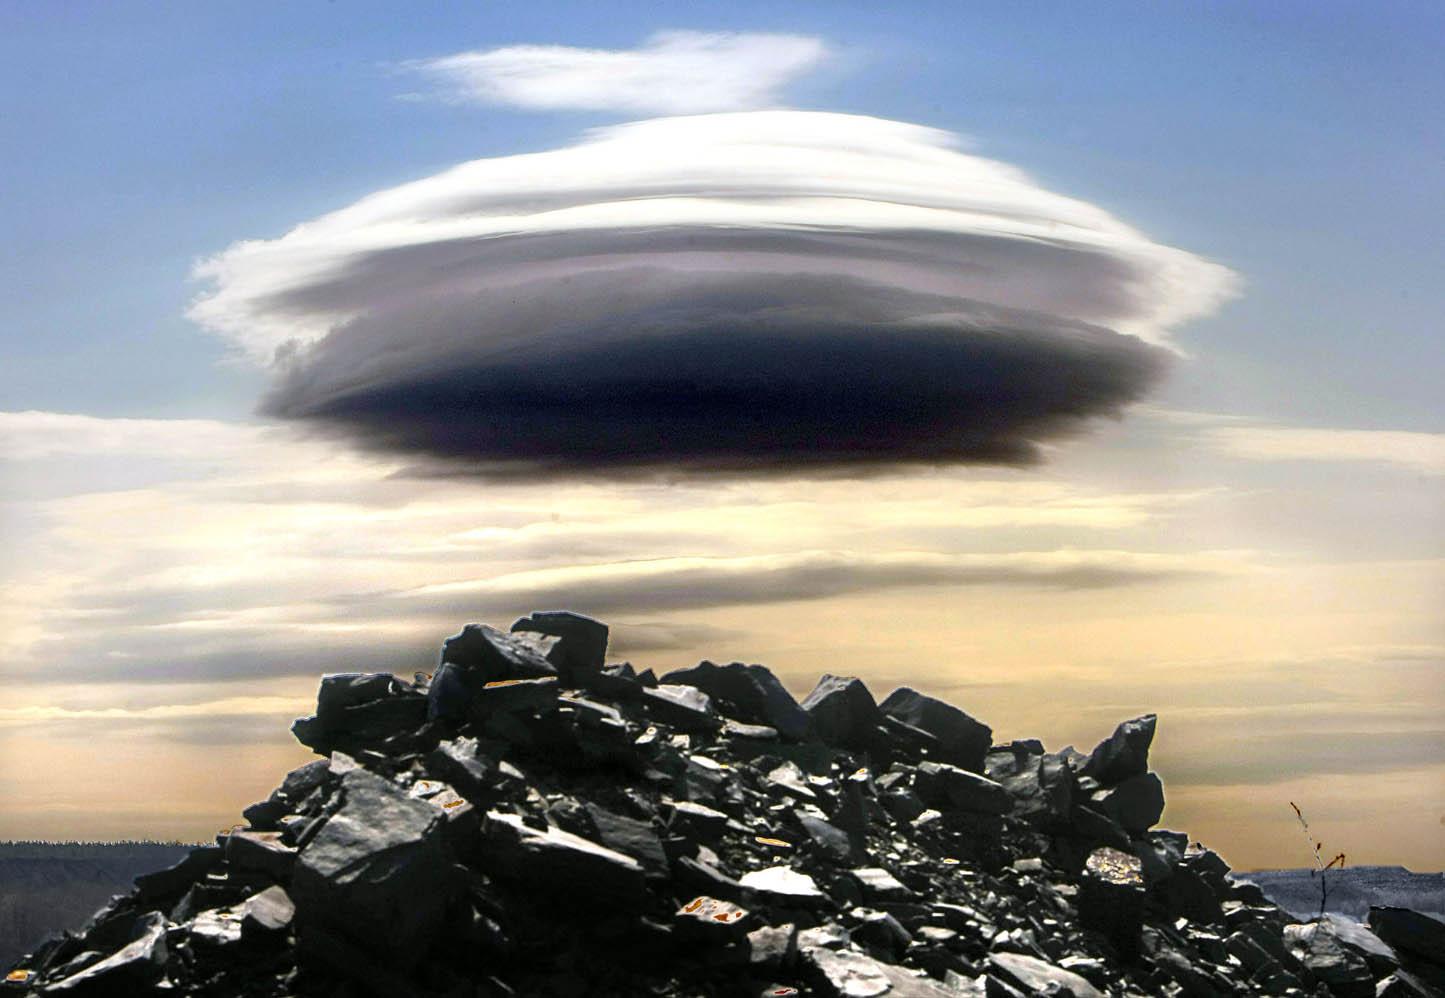 UFO Pics, Humor Collection